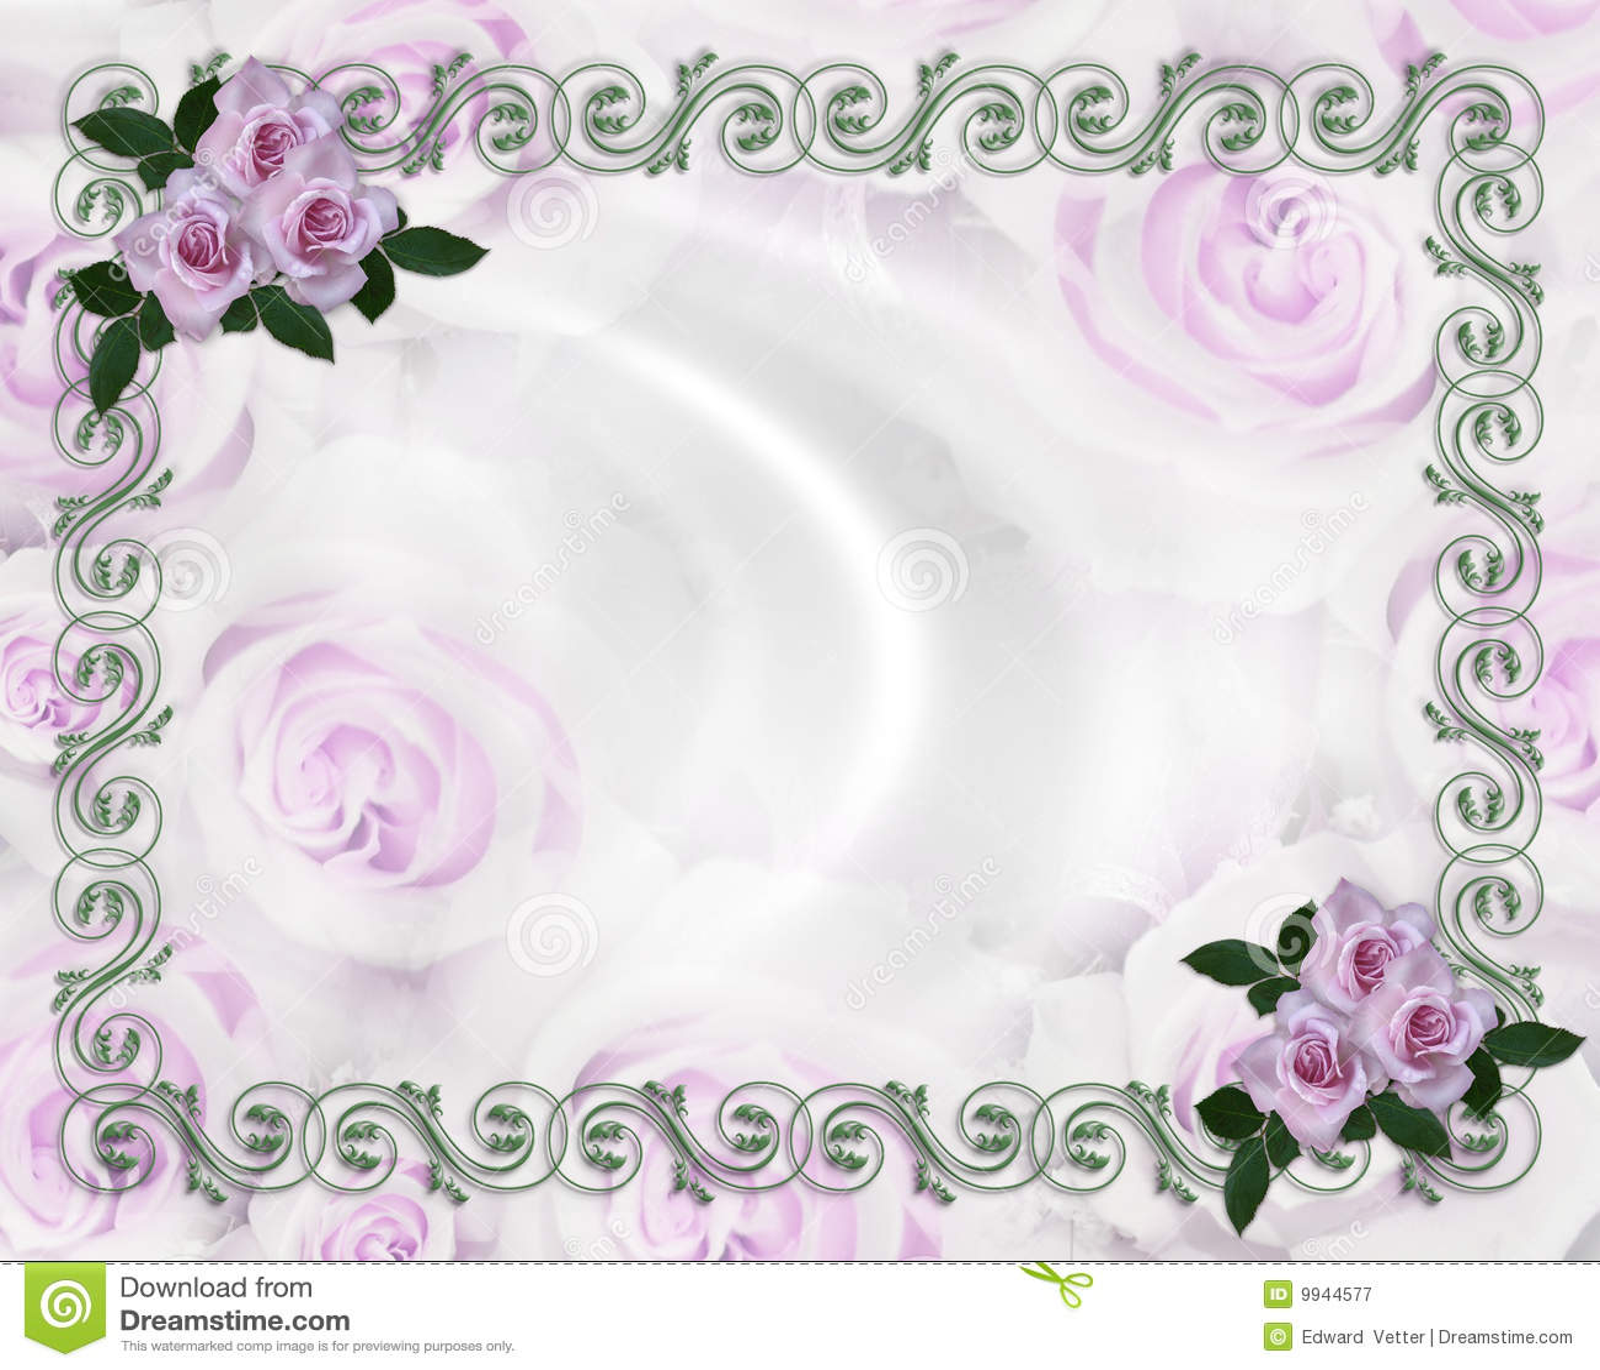 Wedding Invitation Border Lavender Roses Floral Royalty ...